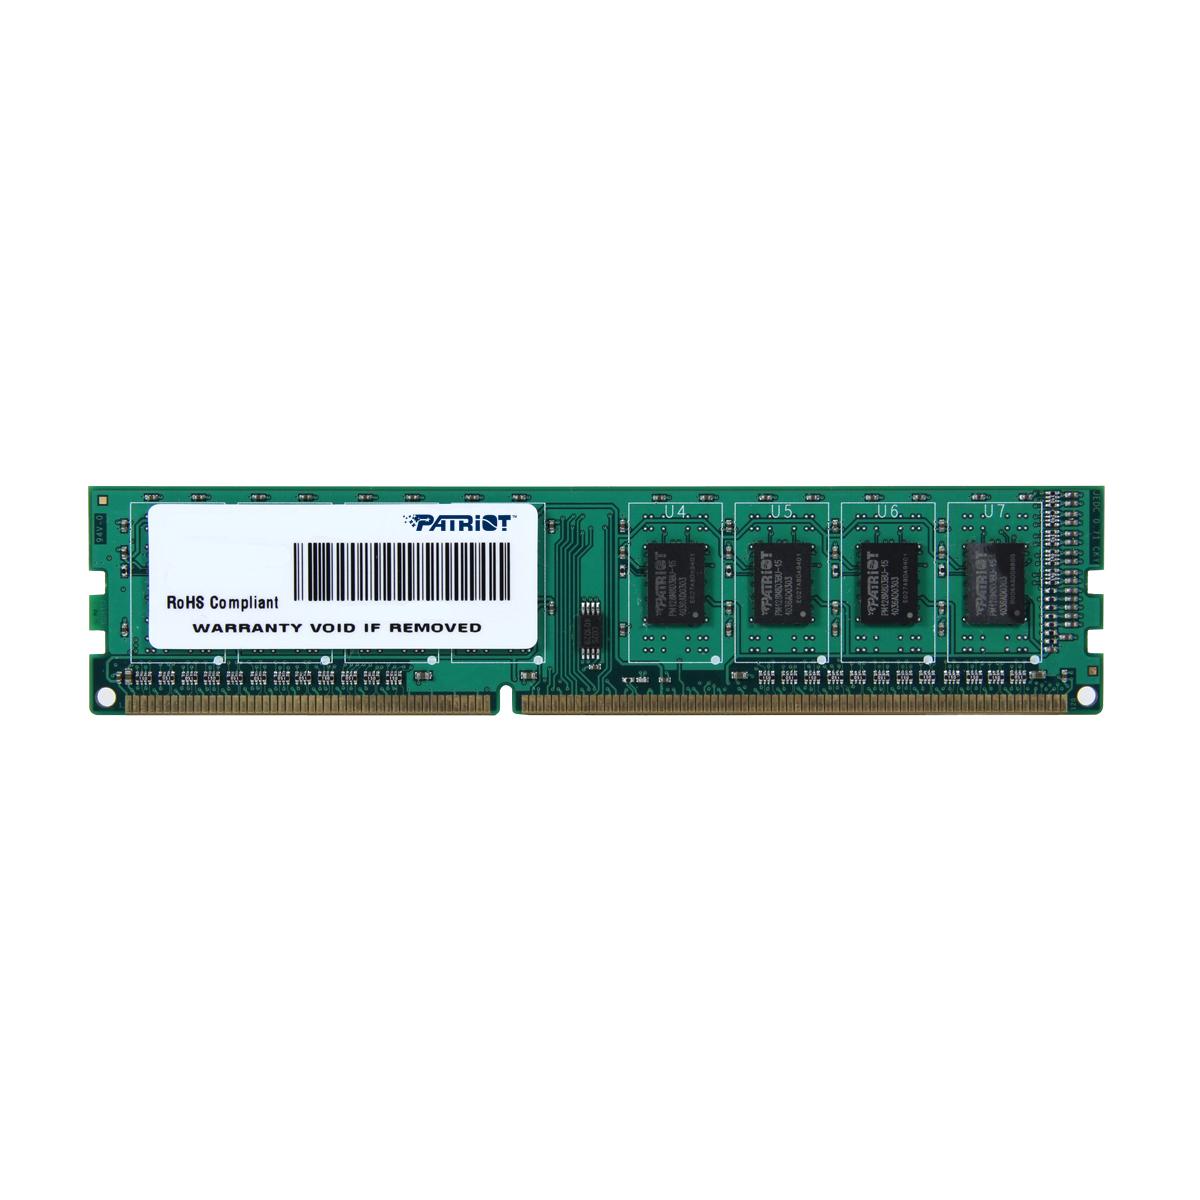 DRAM_DDR3_SL_US_Module_Front